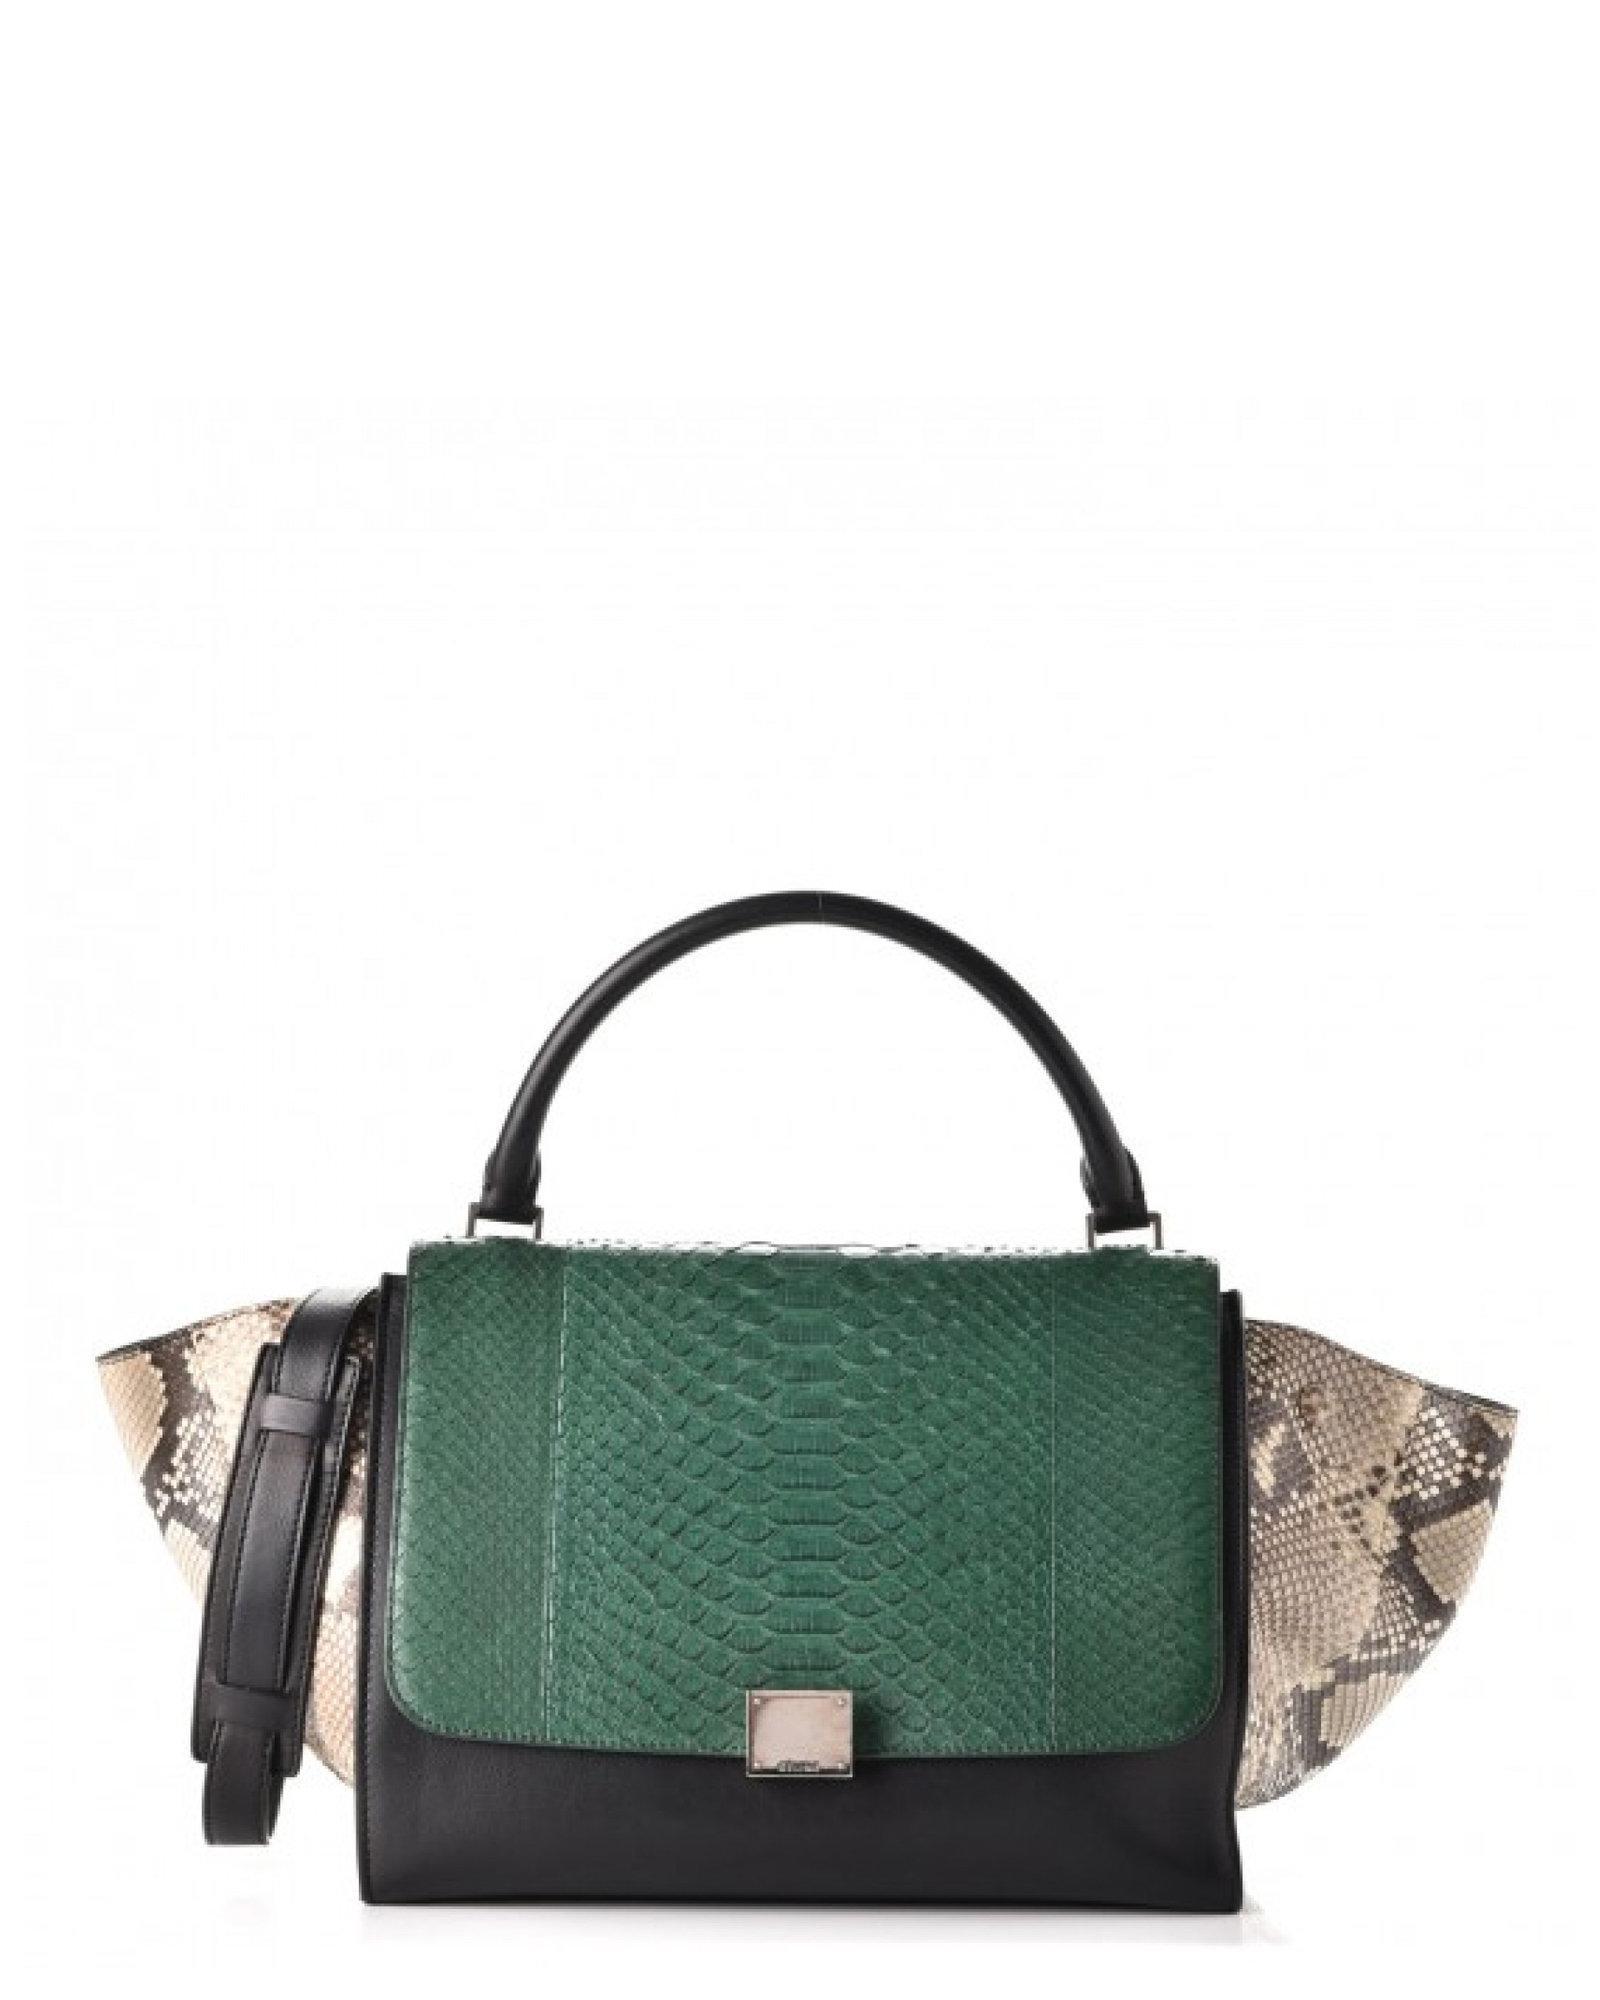 909b06cc57 Céline - Multicolor Python Calfskin Tricolor Medium Trapeze Handbag -  Vintage - Lyst